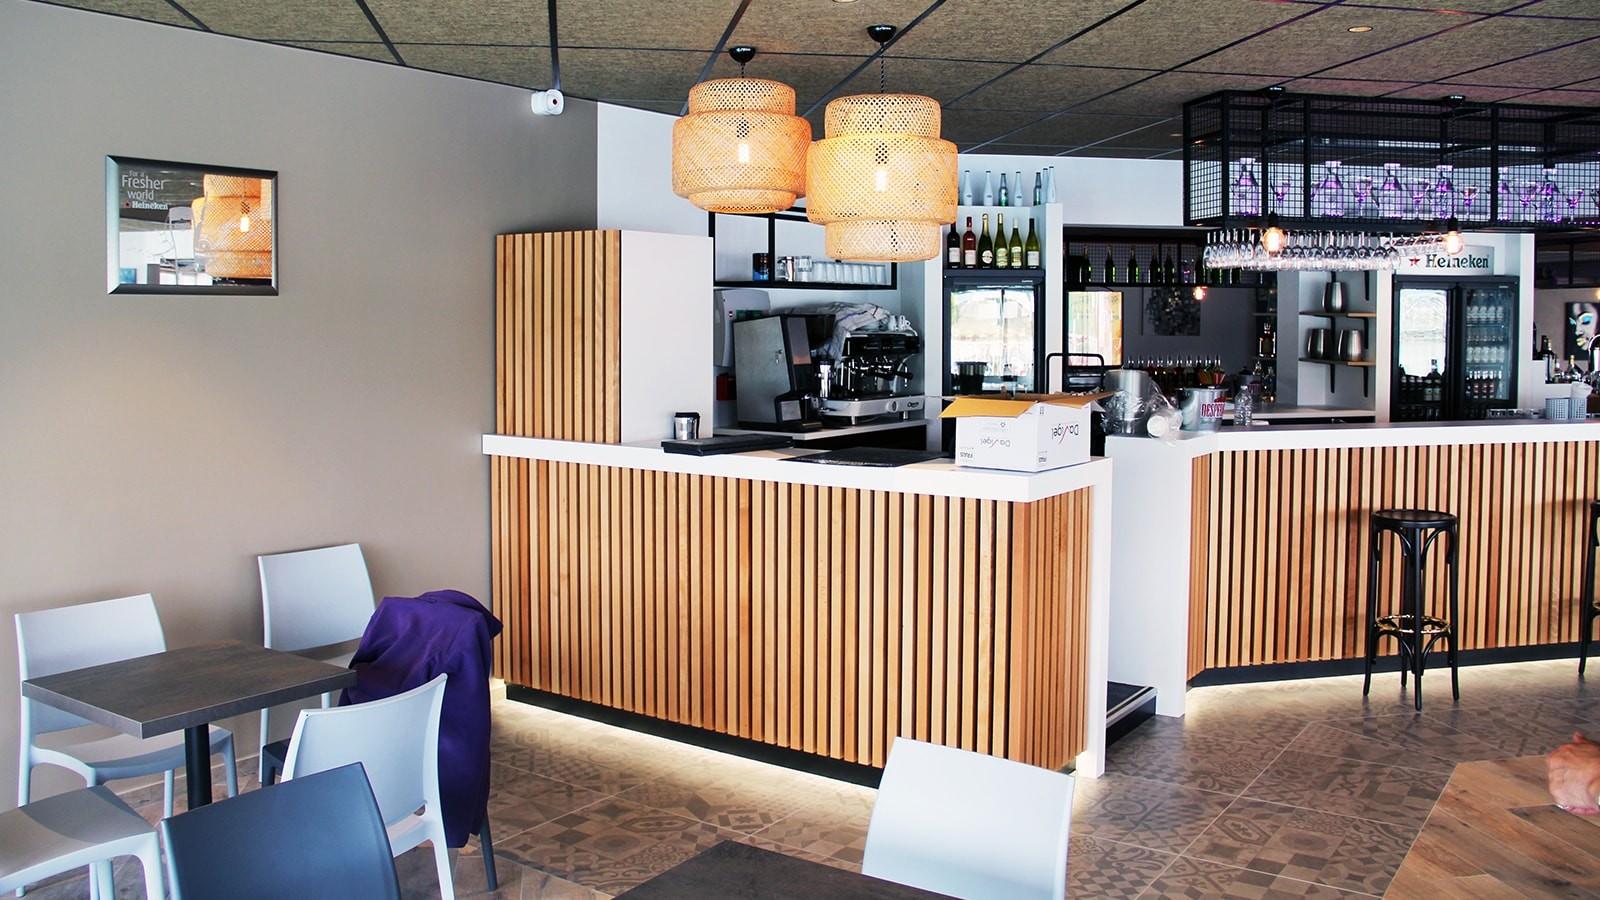 EFI Design Bar Clarys Saint Jean De Monts Efi Design (2) 1211